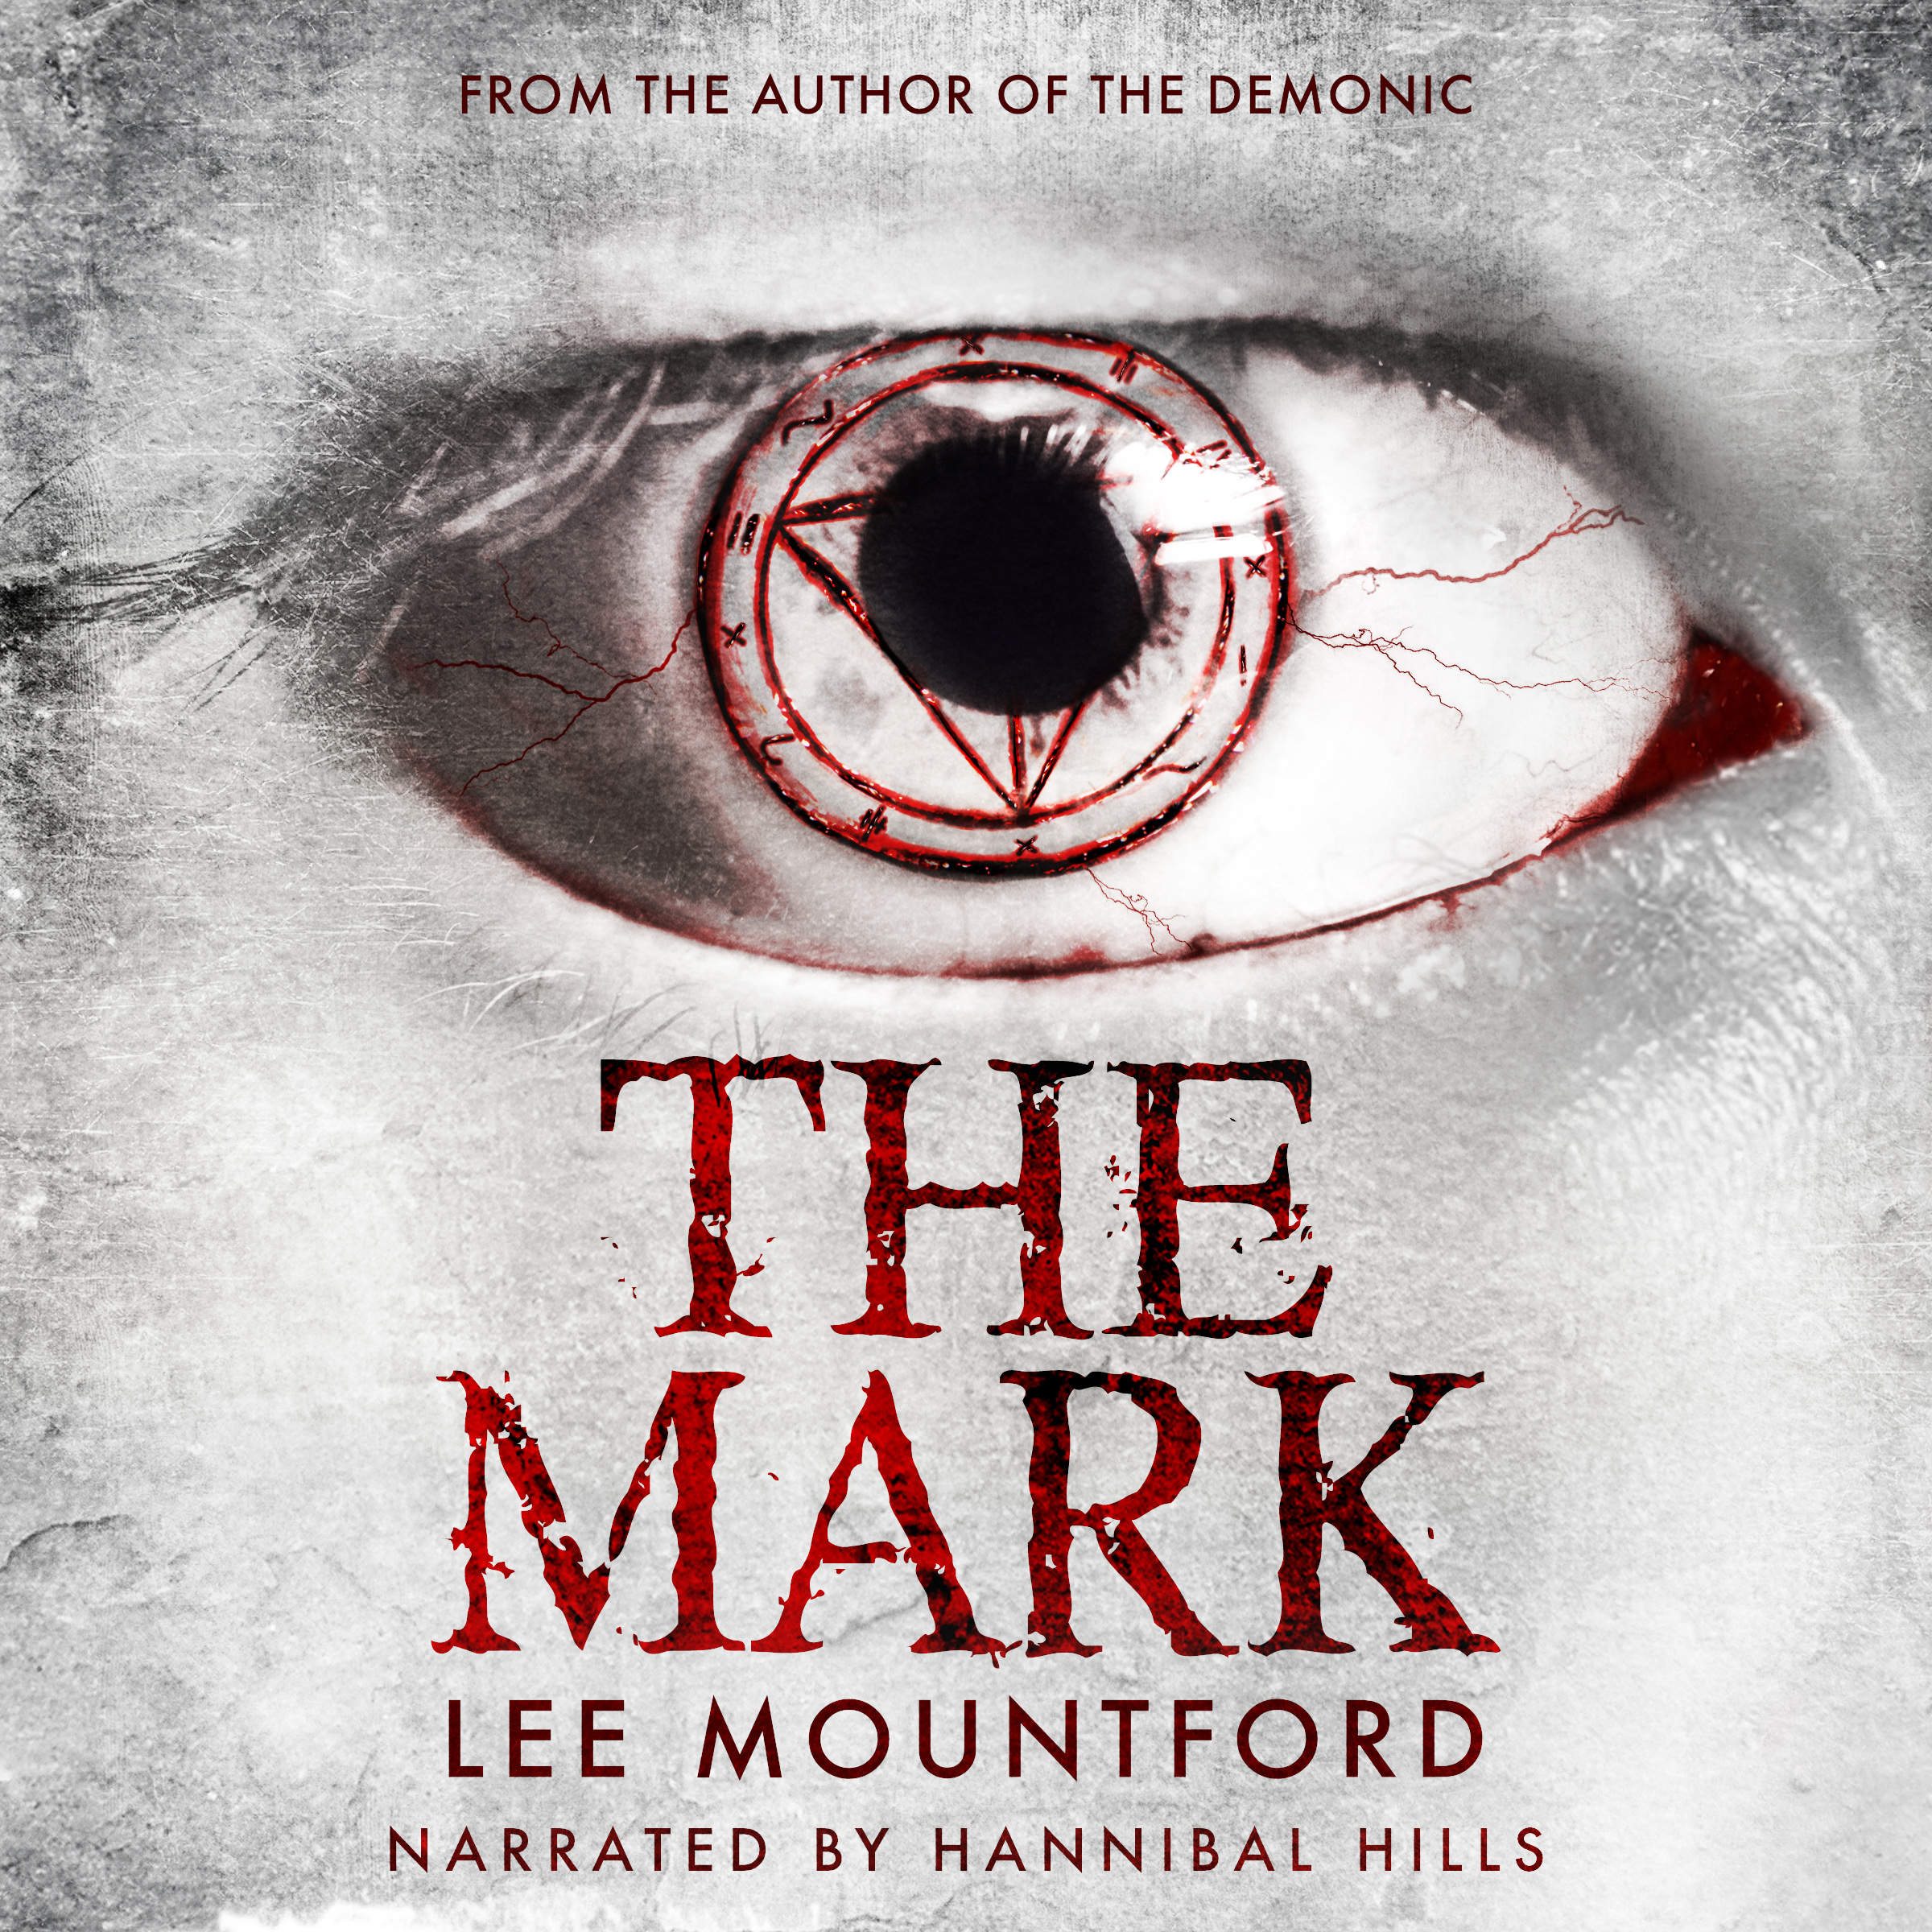 The Mark - Audiobook - Lee Mountford - Author